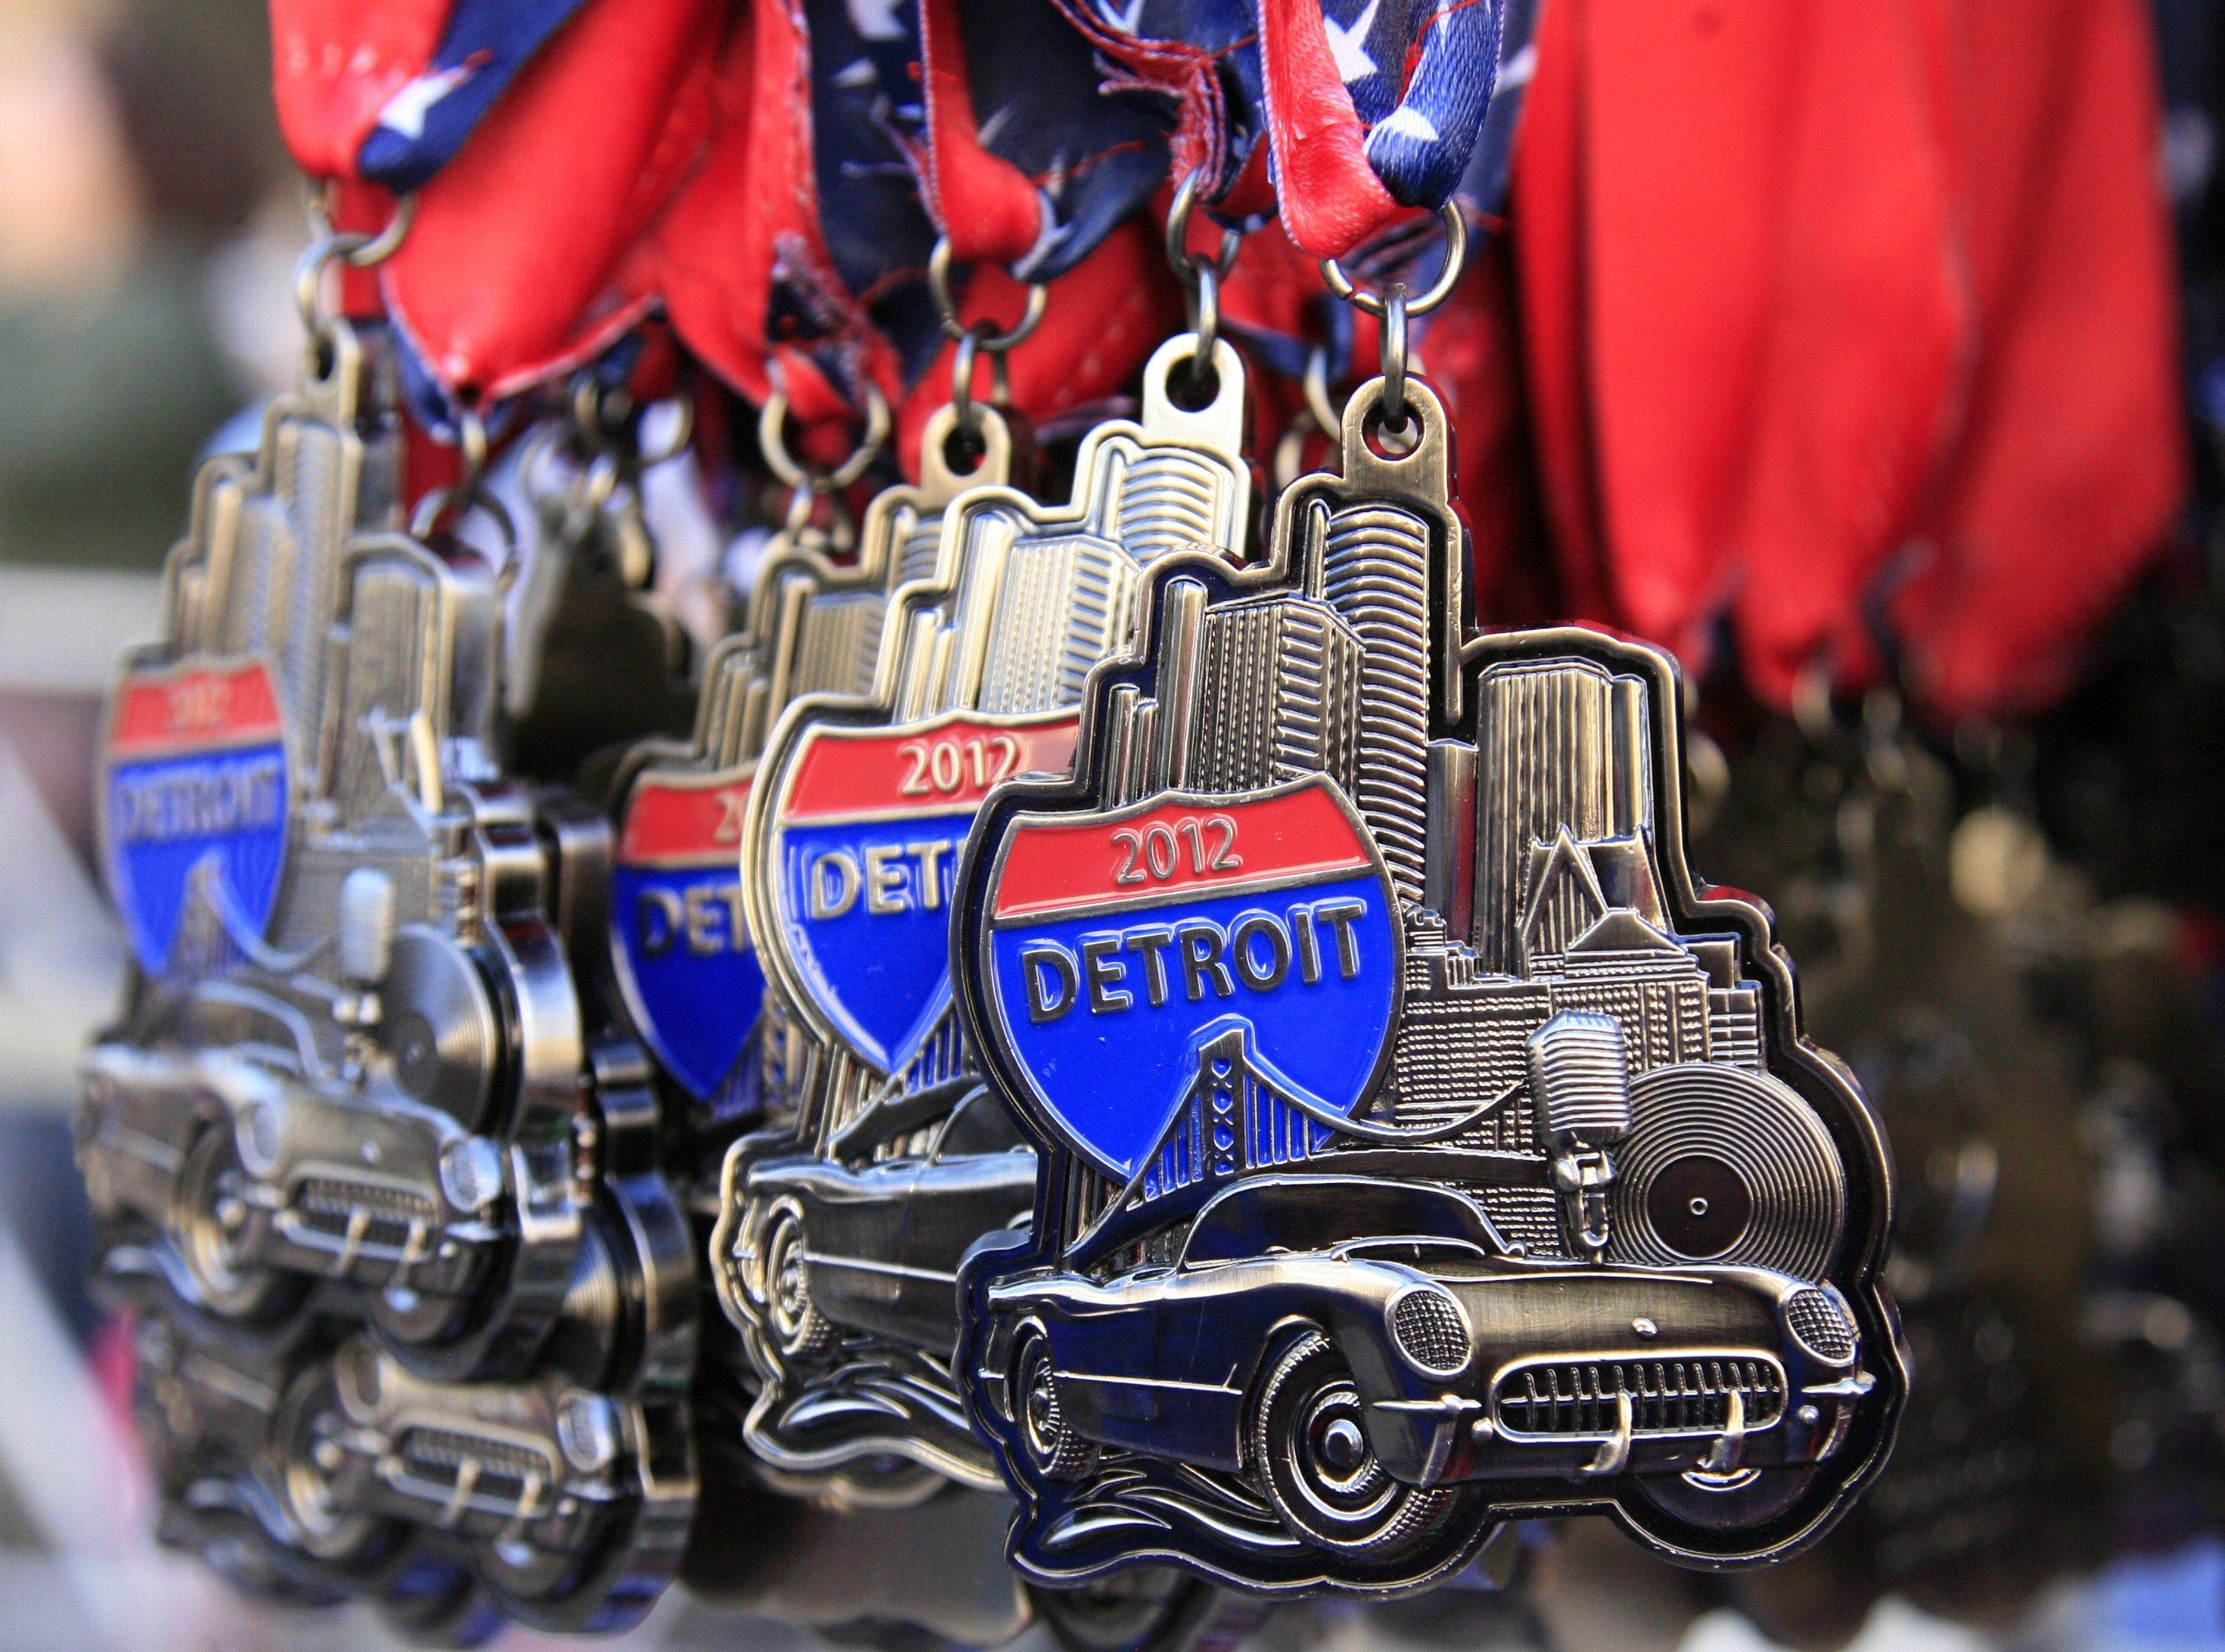 Marathon medals hang at the Detroit Free Press/Talmer Bank Marathon in Detroit, Sunday, Oct. 21, 2012.